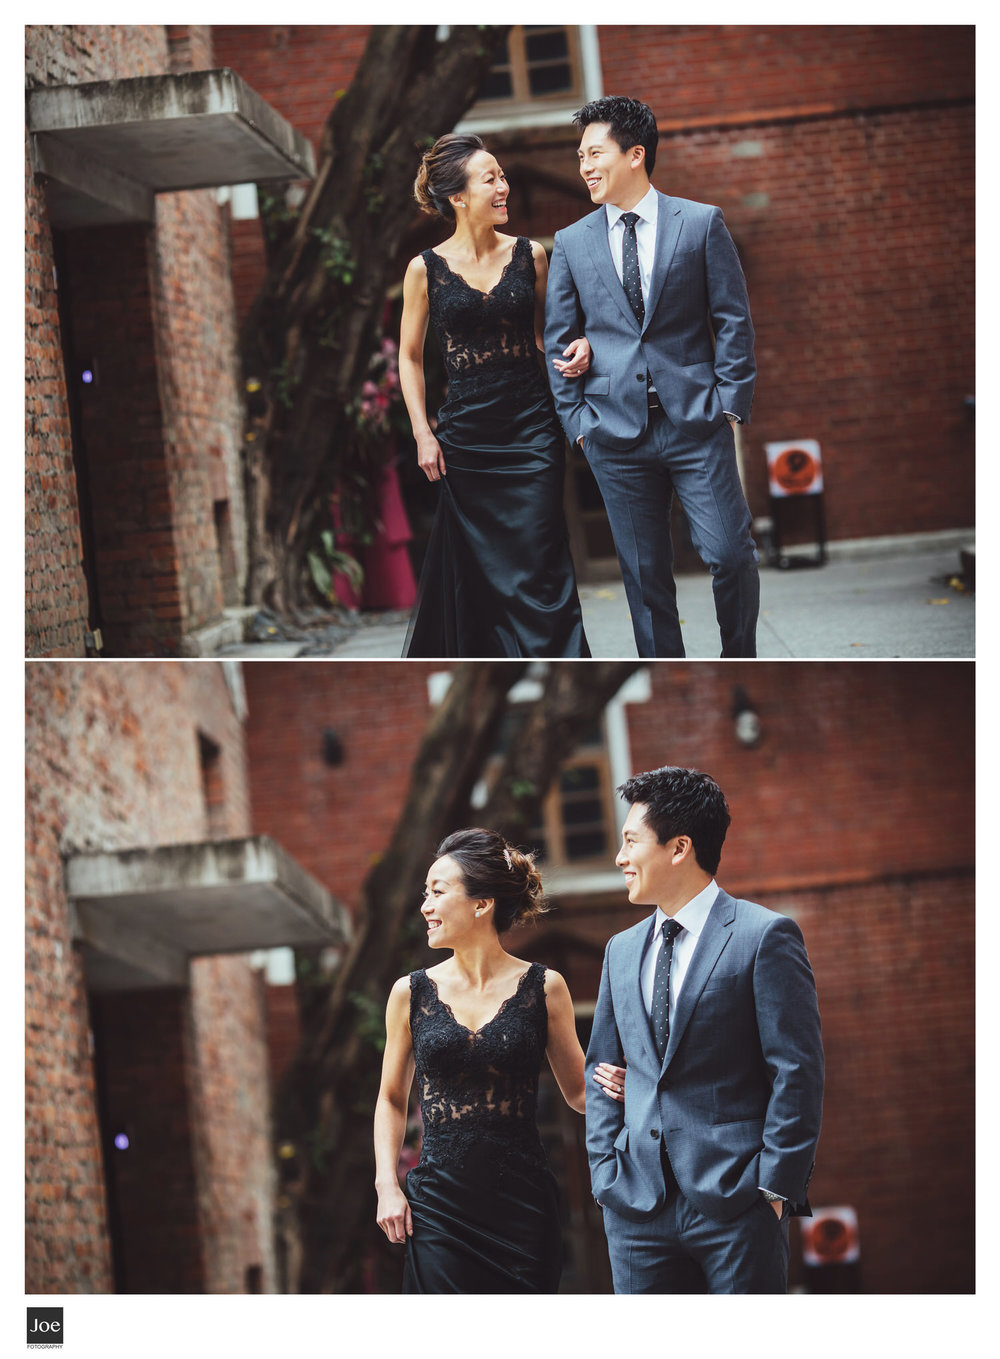 joefotography-taiwan-pre-wedding-annie-aaron-07.jpg